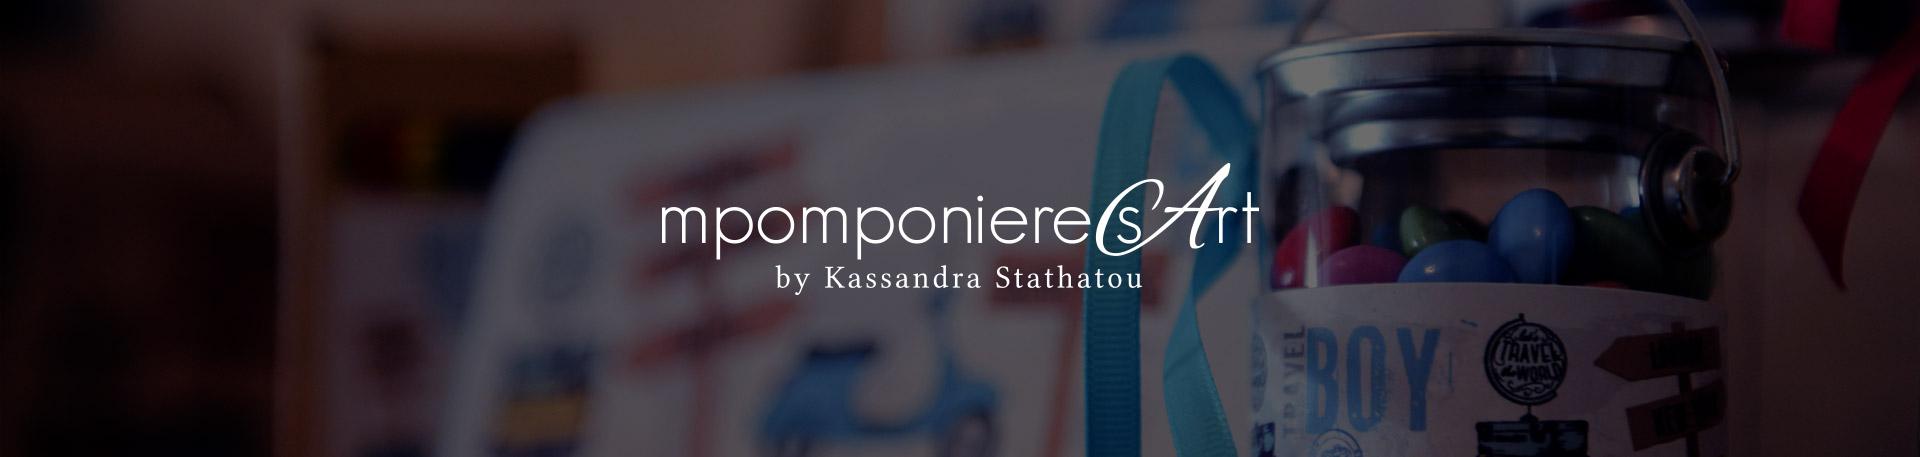 mpomponieresart cover